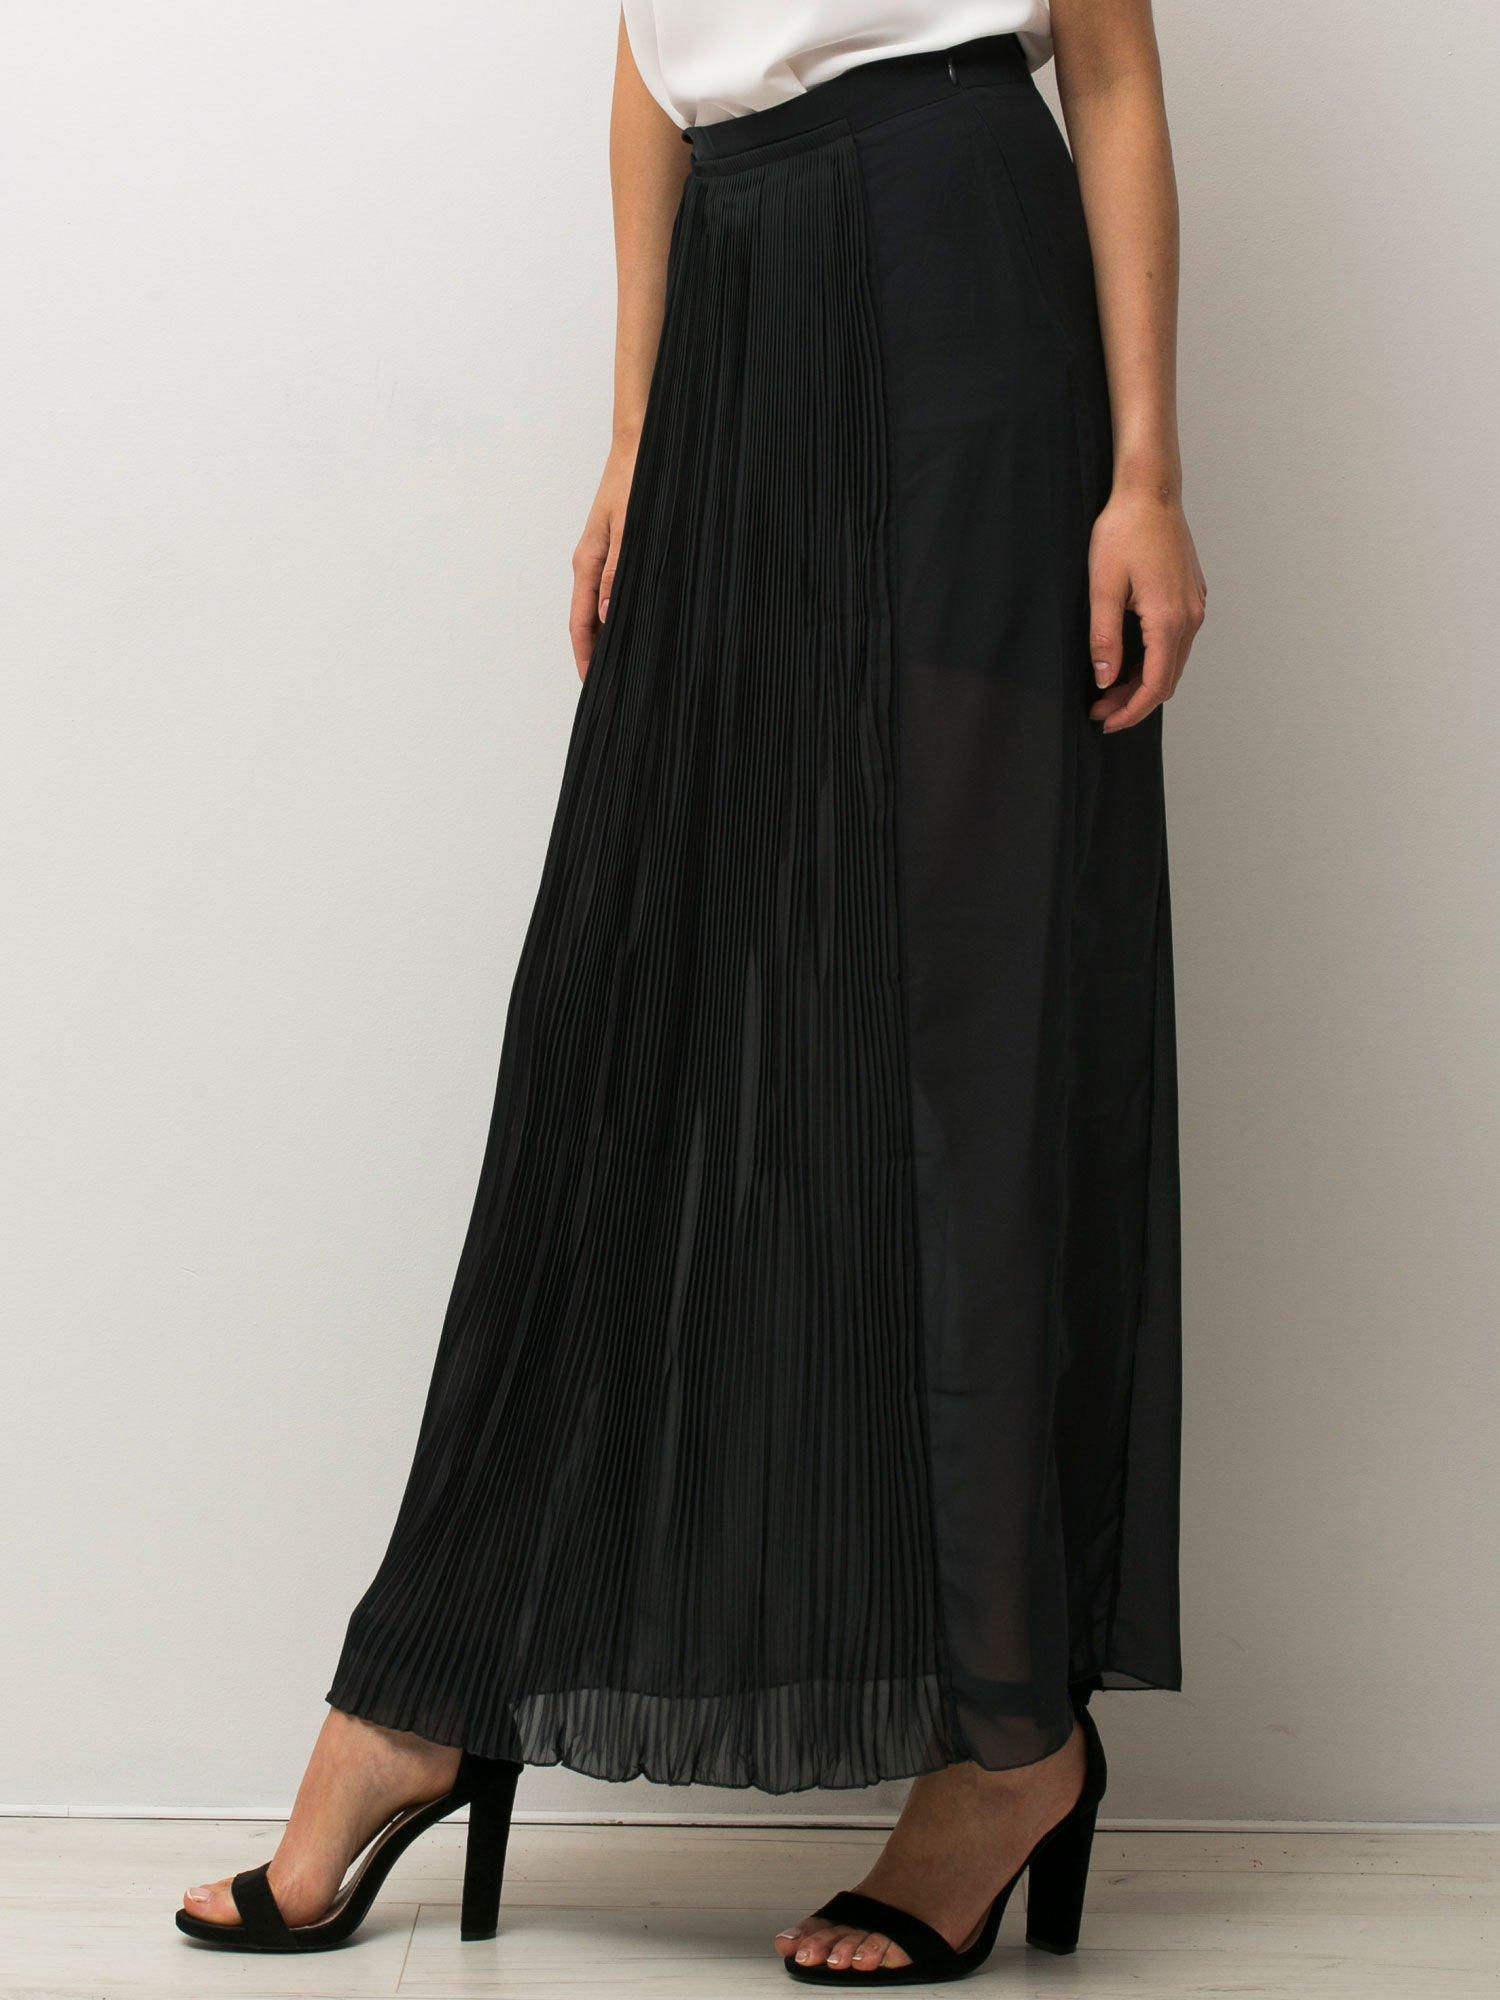 Czarna półtransparentna spódnica maxi plisowana                                  zdj.                                  3